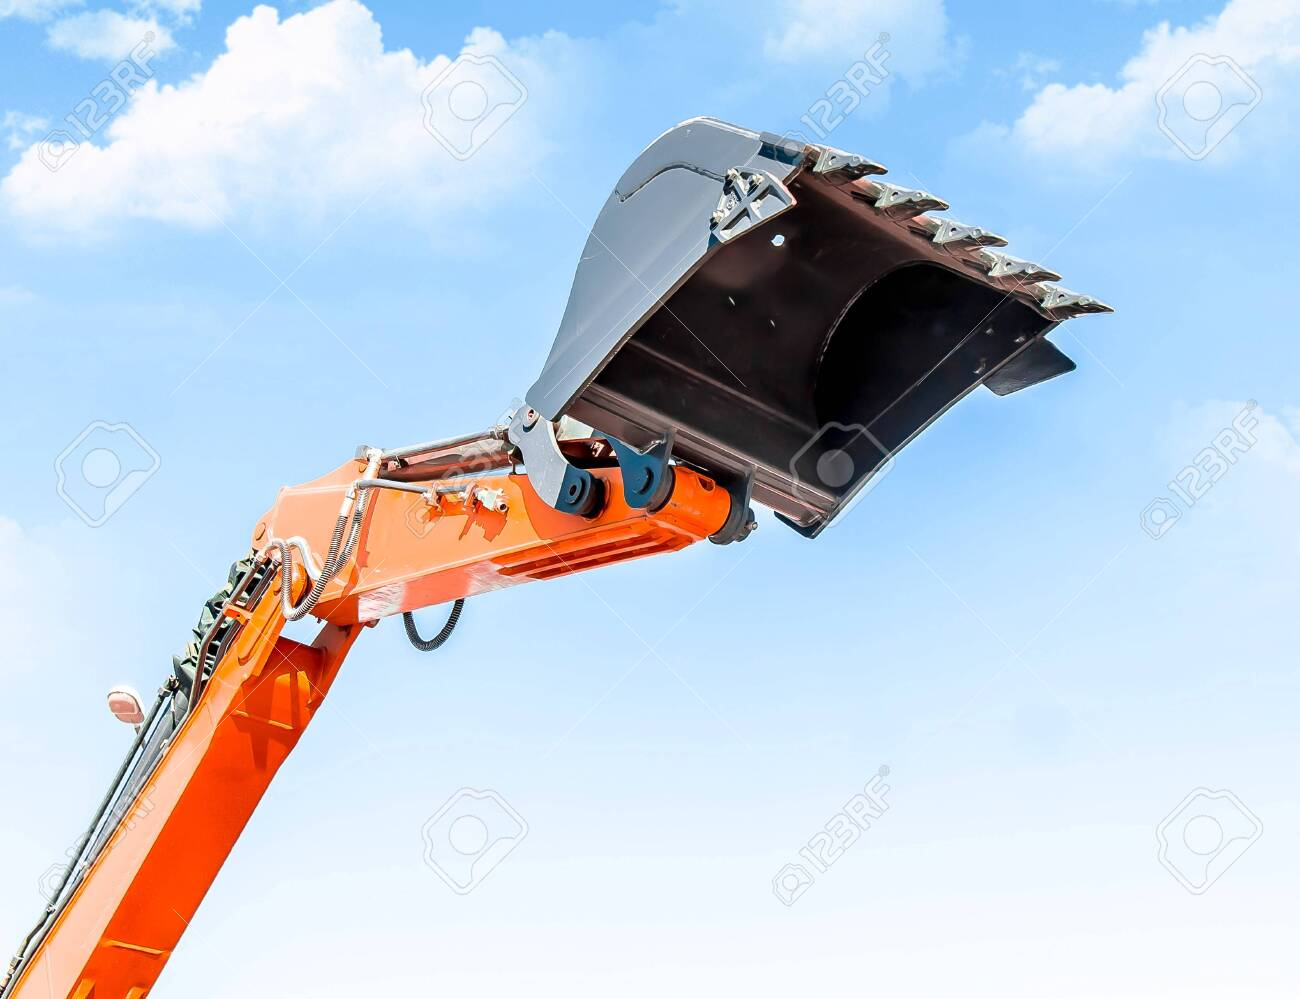 Excavator bucket against the sky - 123656179